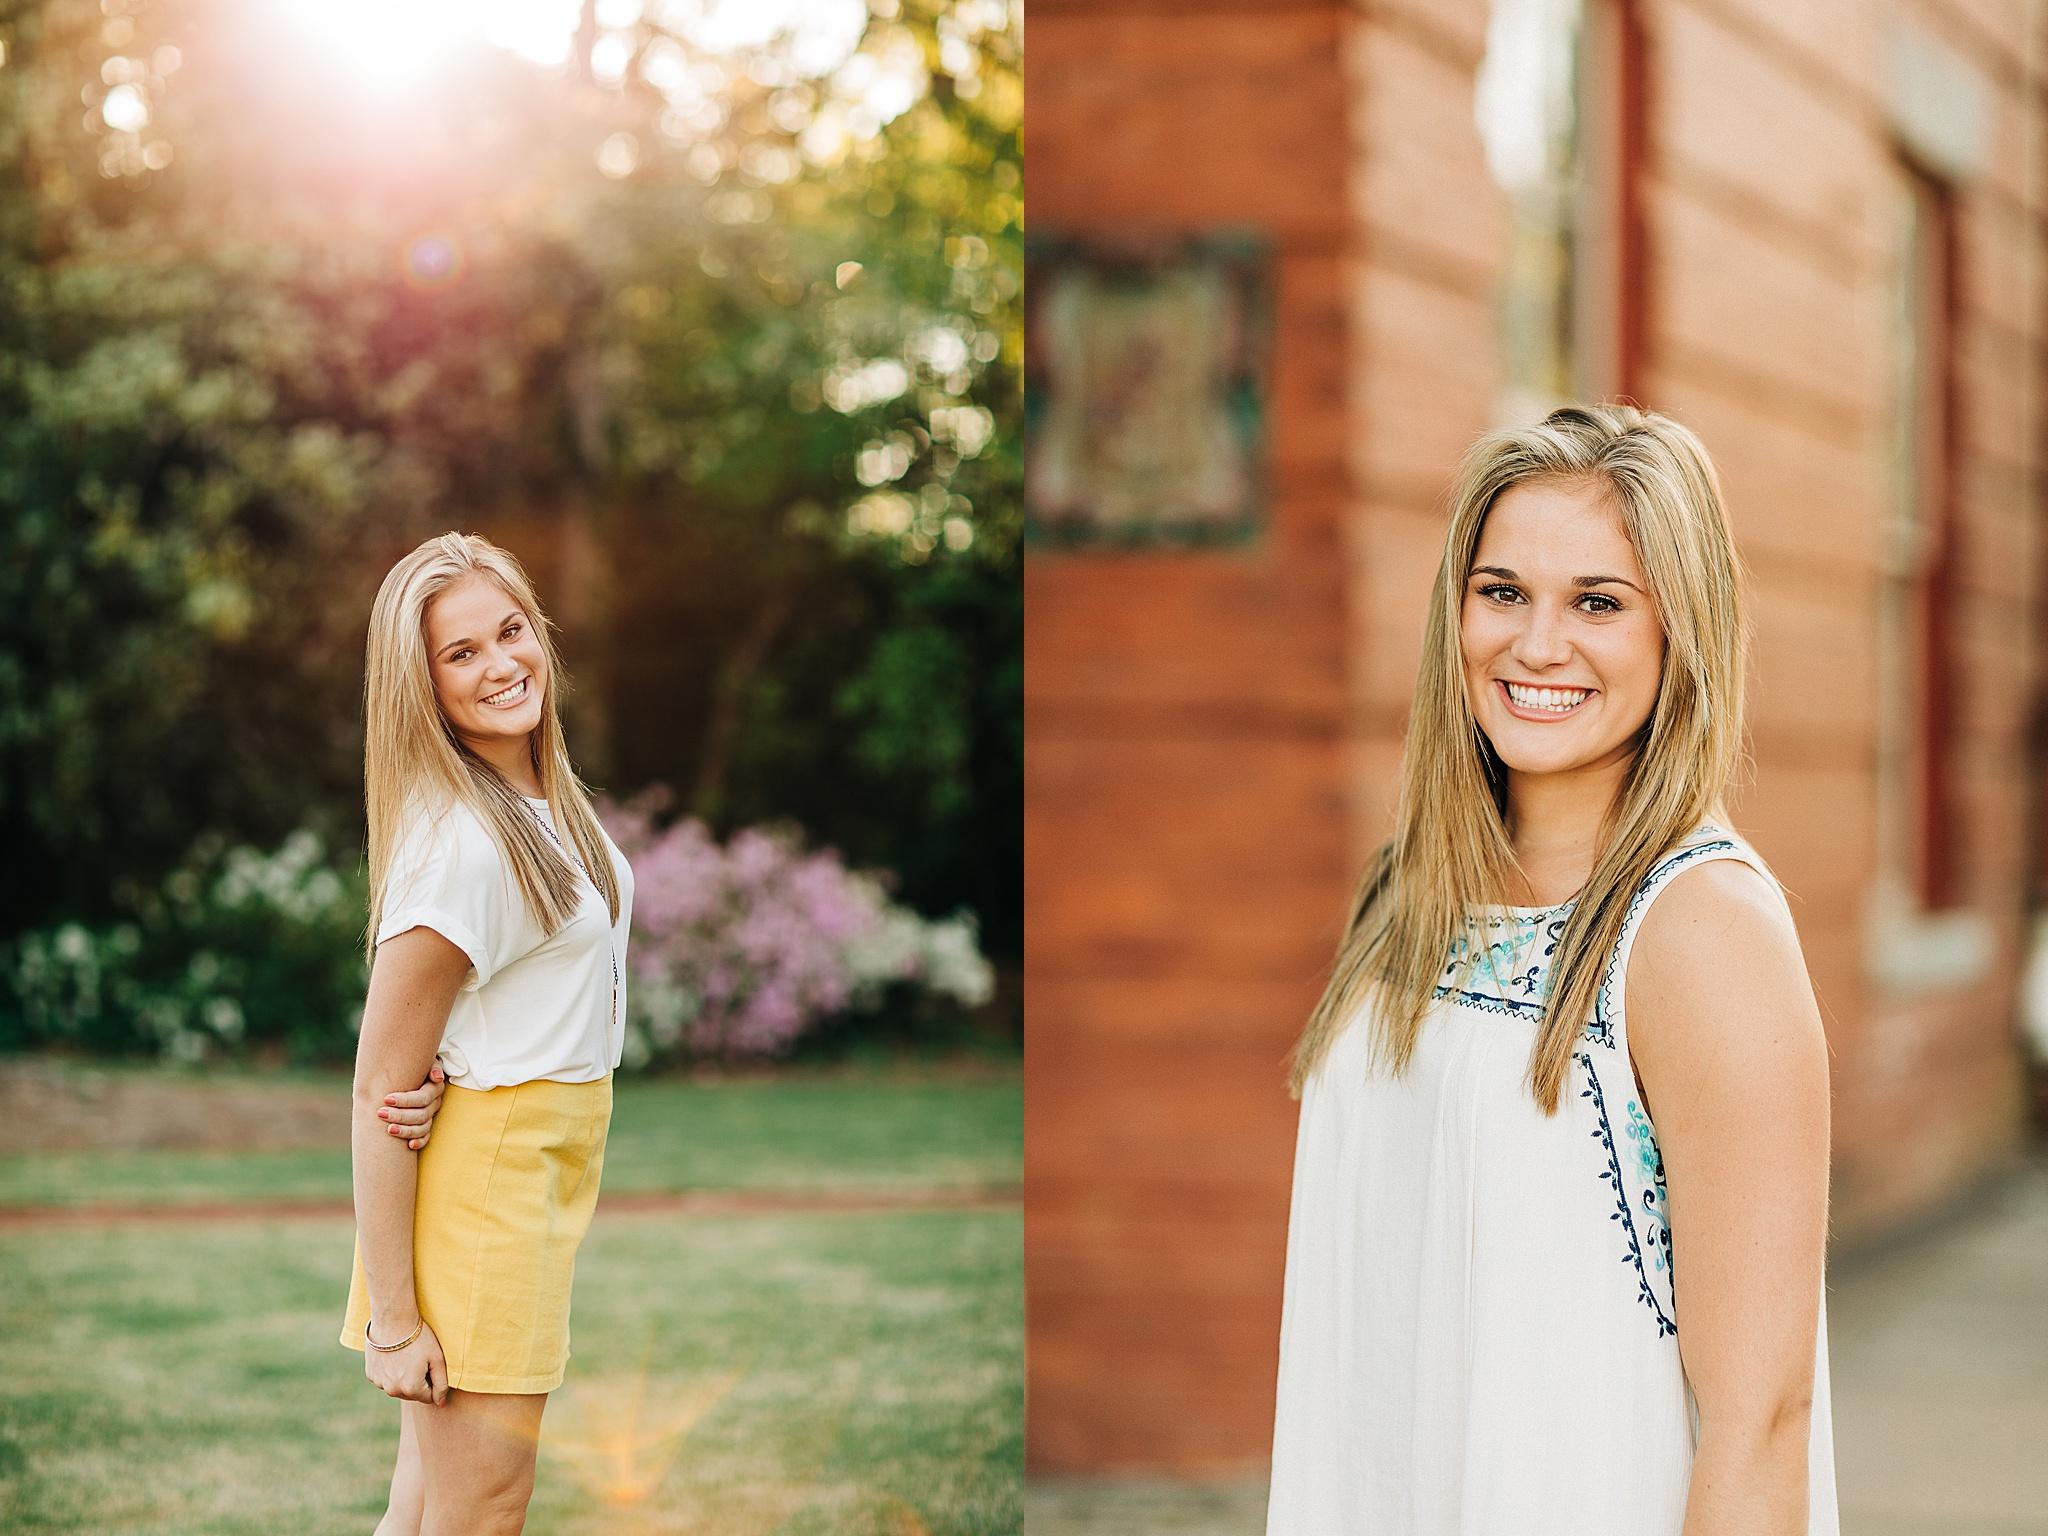 heather-wall-senior-portraits.jpg